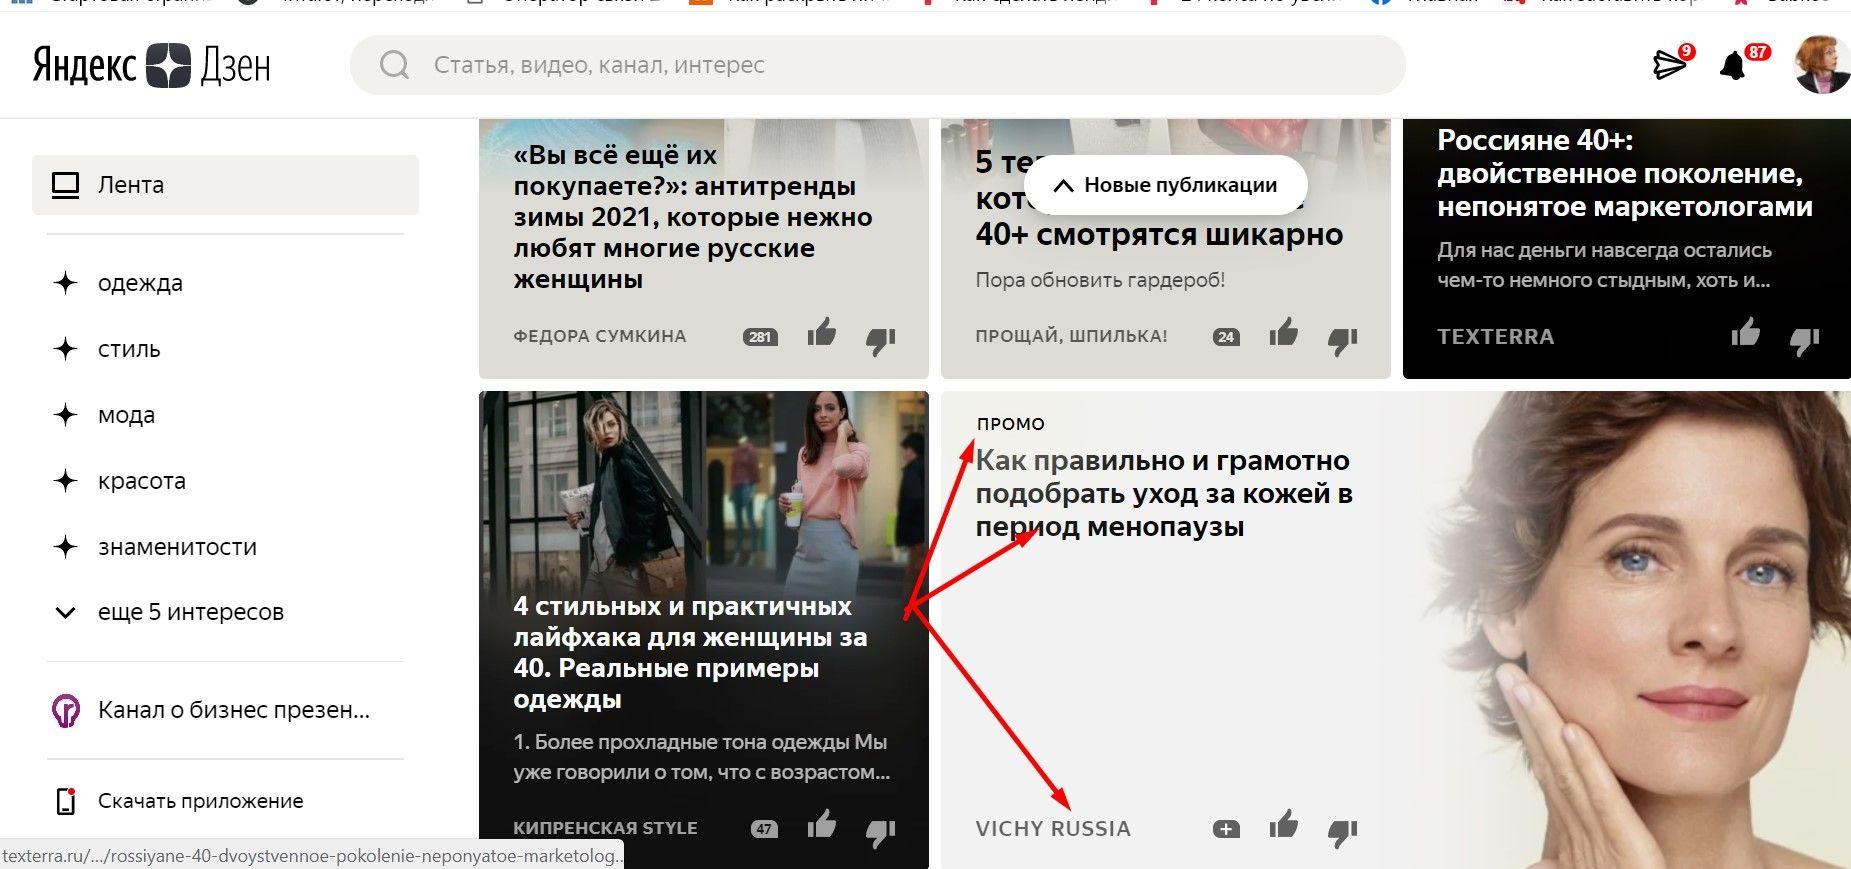 В ленте Яндекс.Дзена полно нативной рекламы